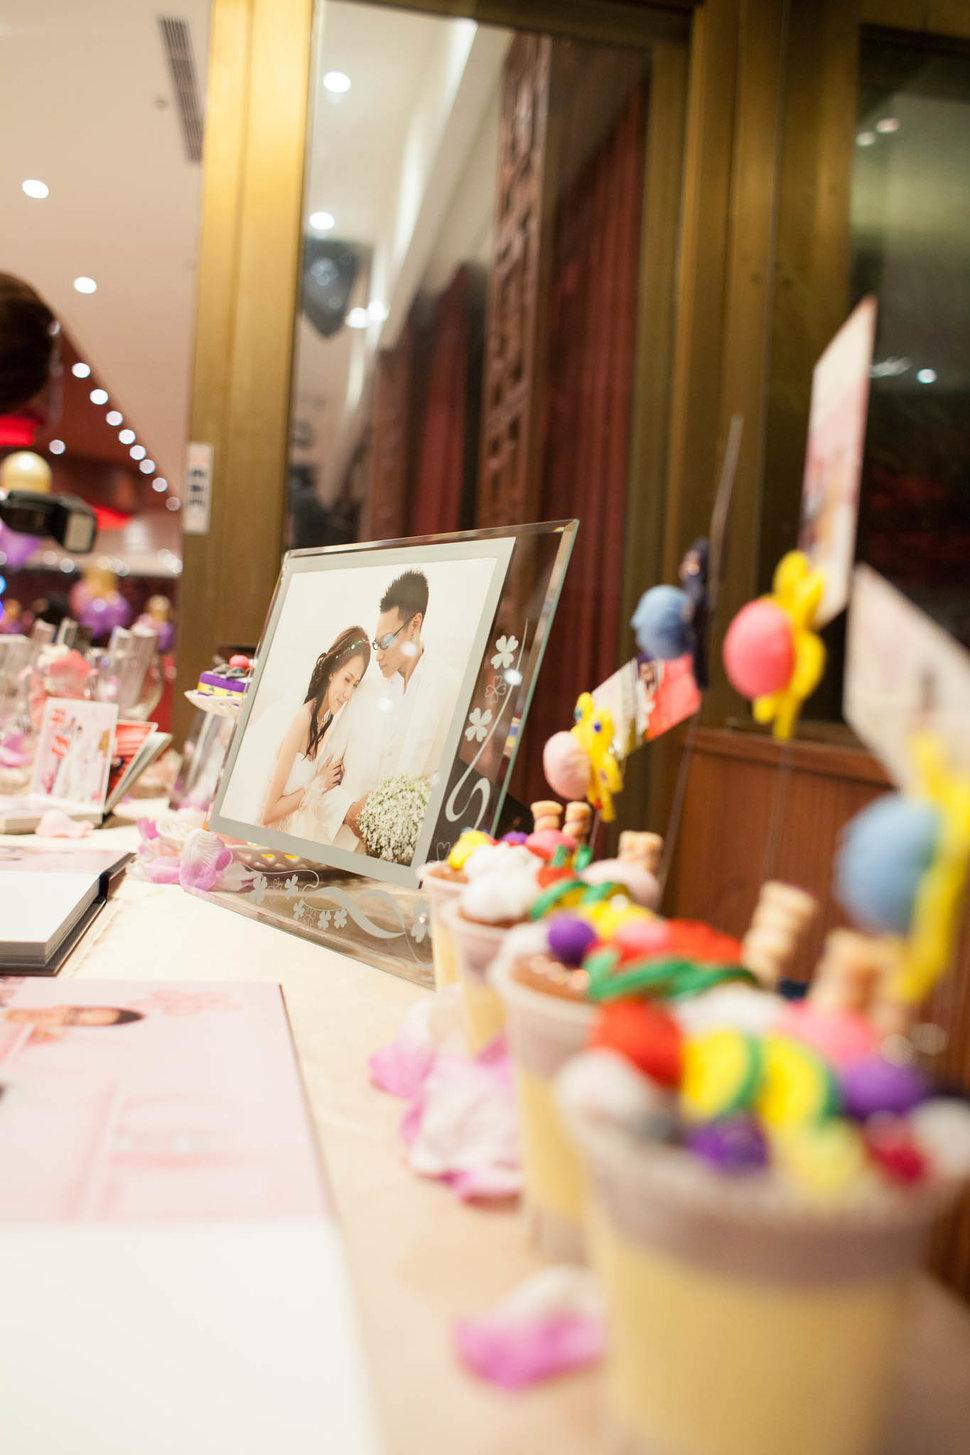 18PHOTO-青蛙王子娶新娘❤️(編號:218636) - 18PHOTO 婚紗影像攝影工作室 - 結婚吧